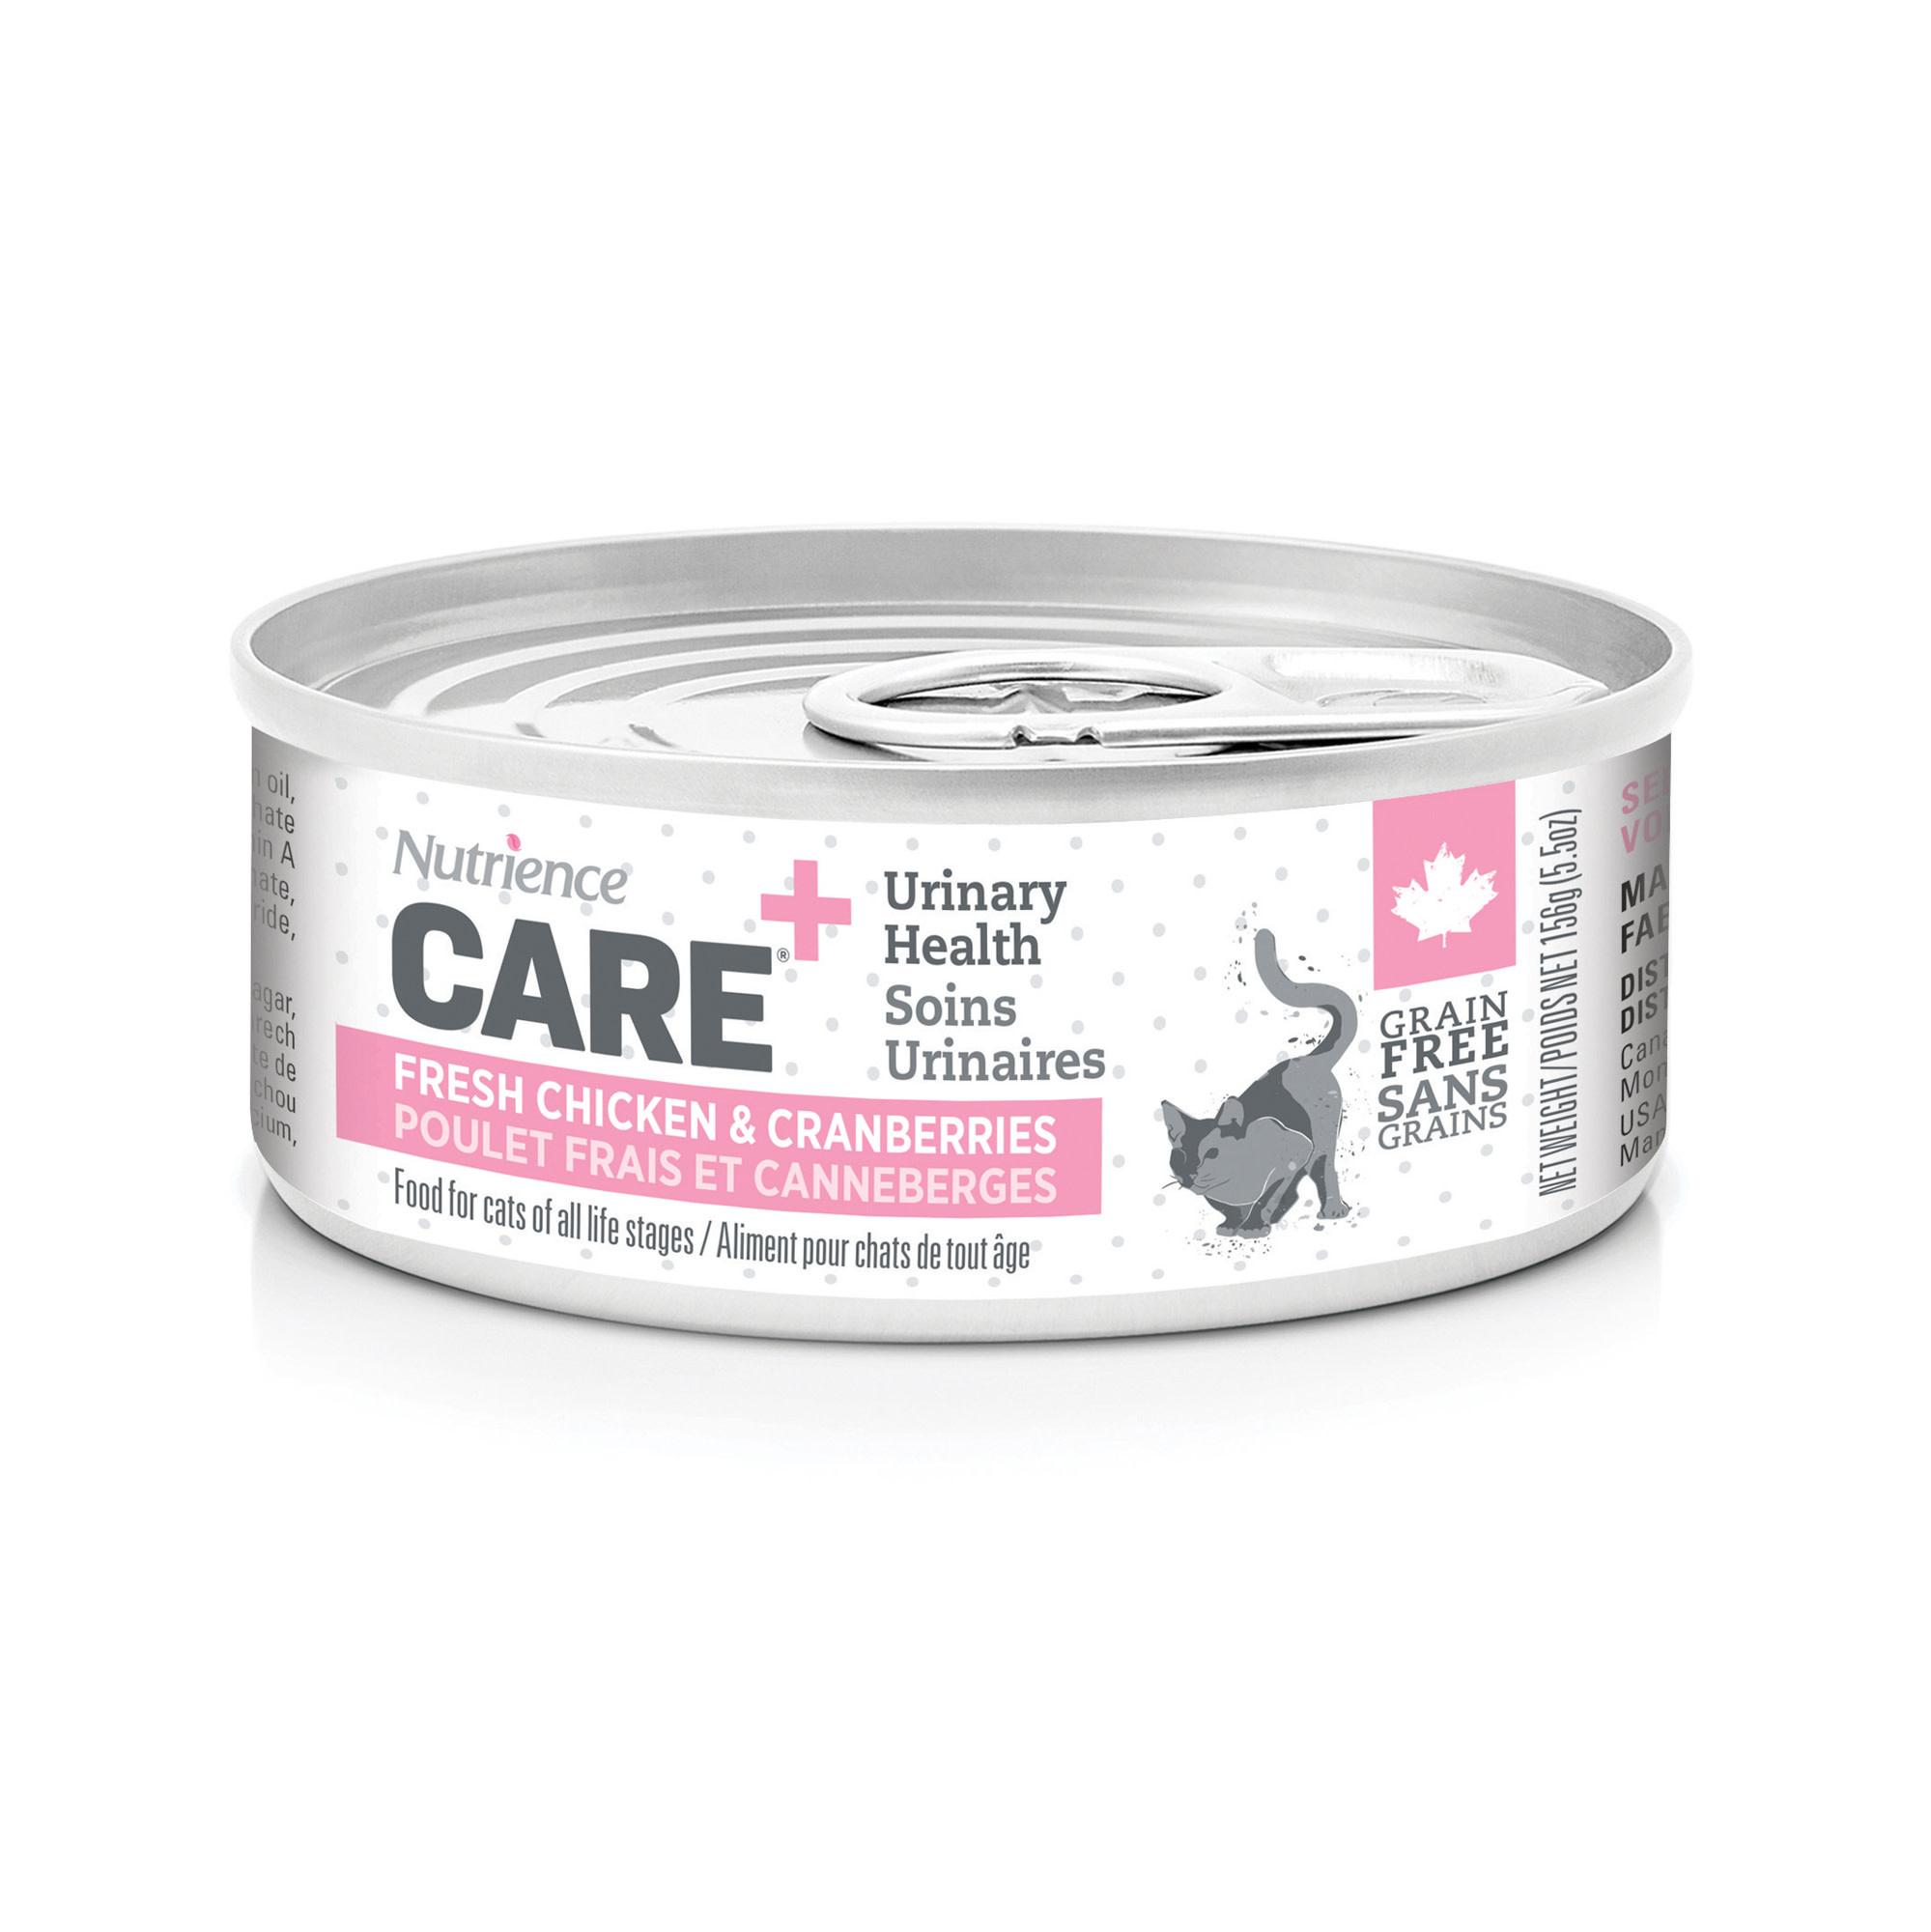 Care Urinary Health Cat Food 156gm-1